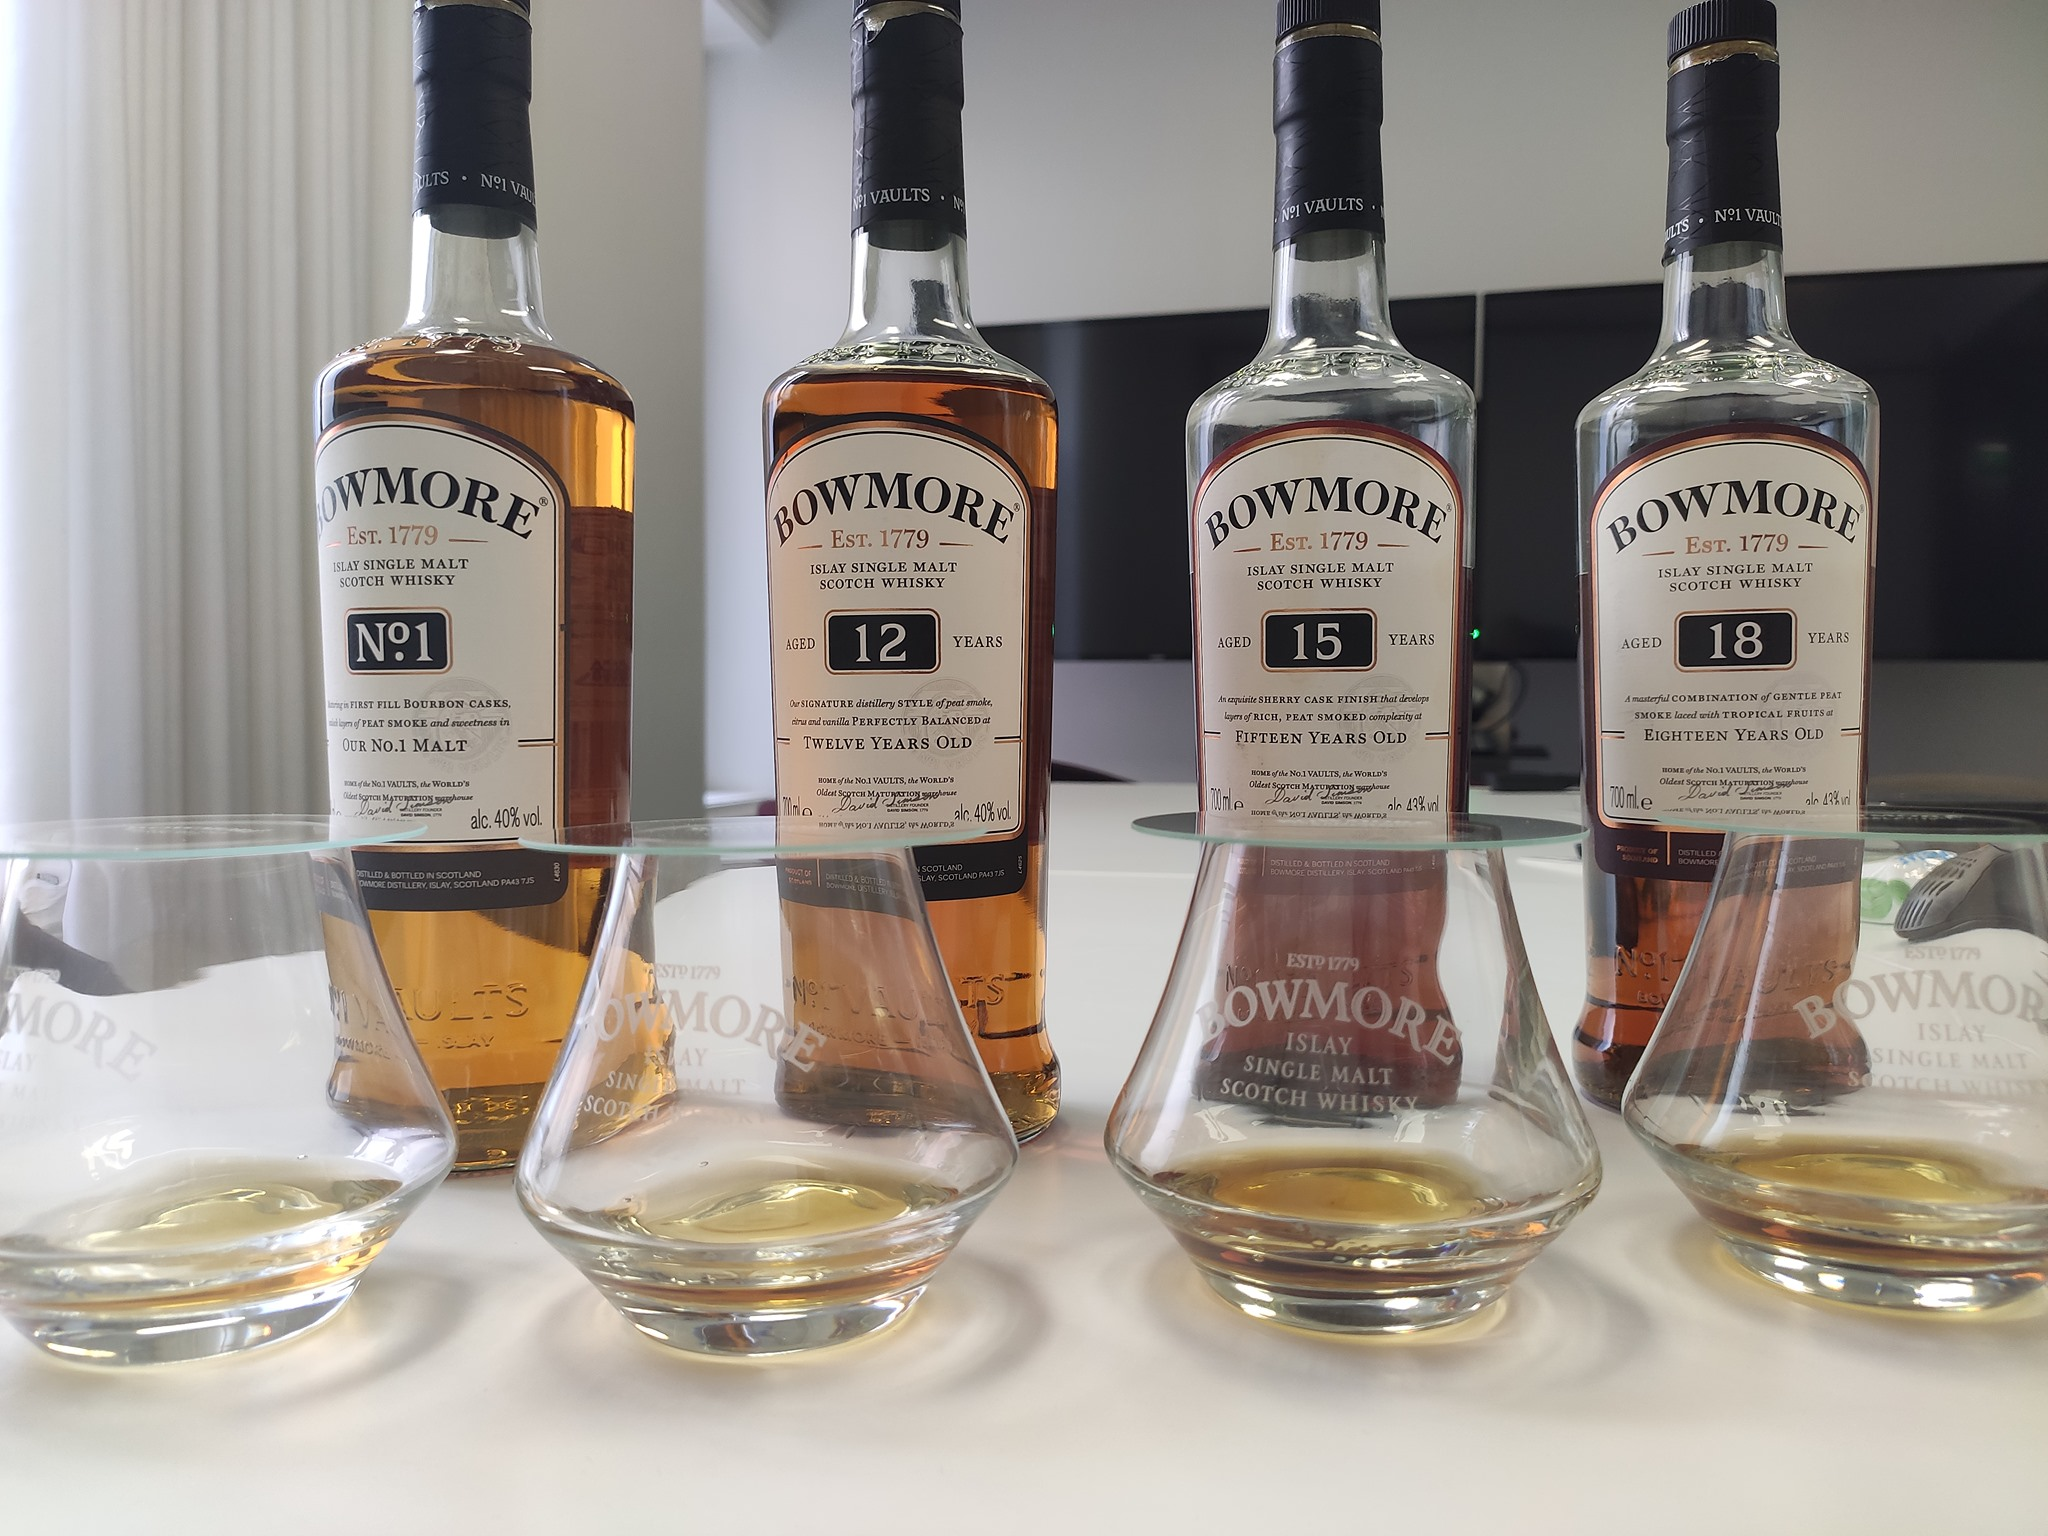 Dégustation de whisky Bowmore